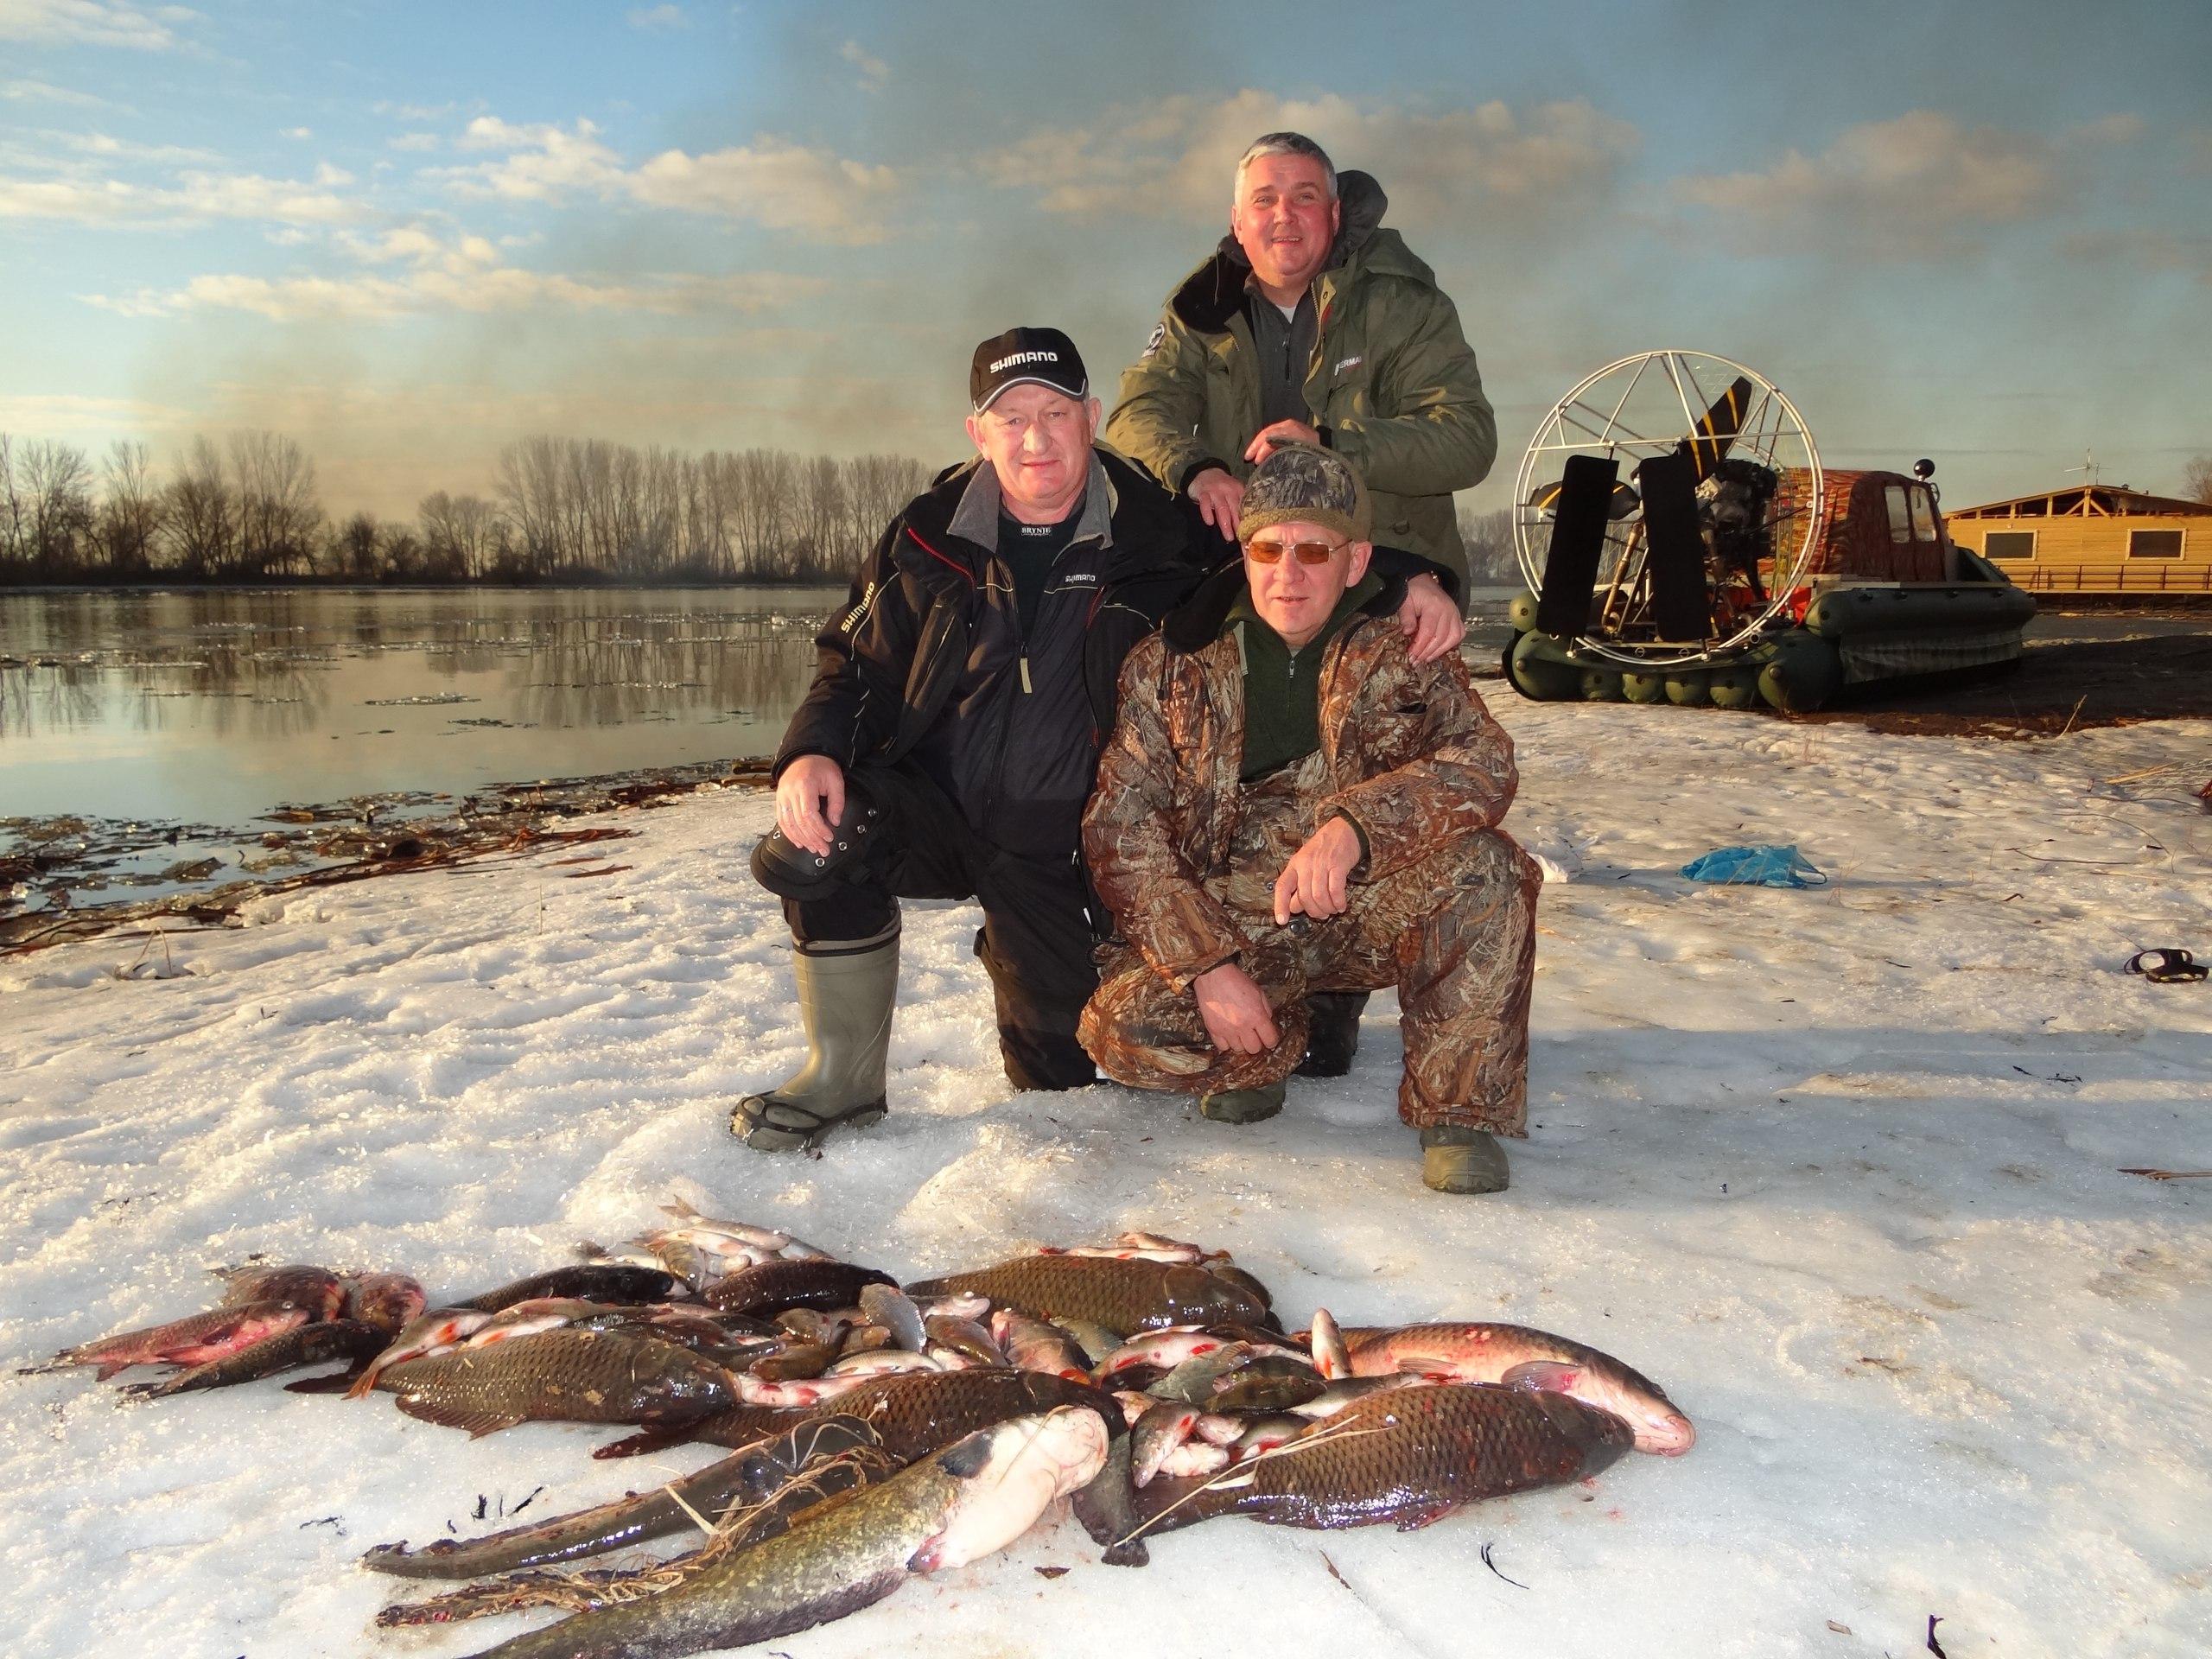 Рыбалка гостей 28-02-16  |«Застава»|